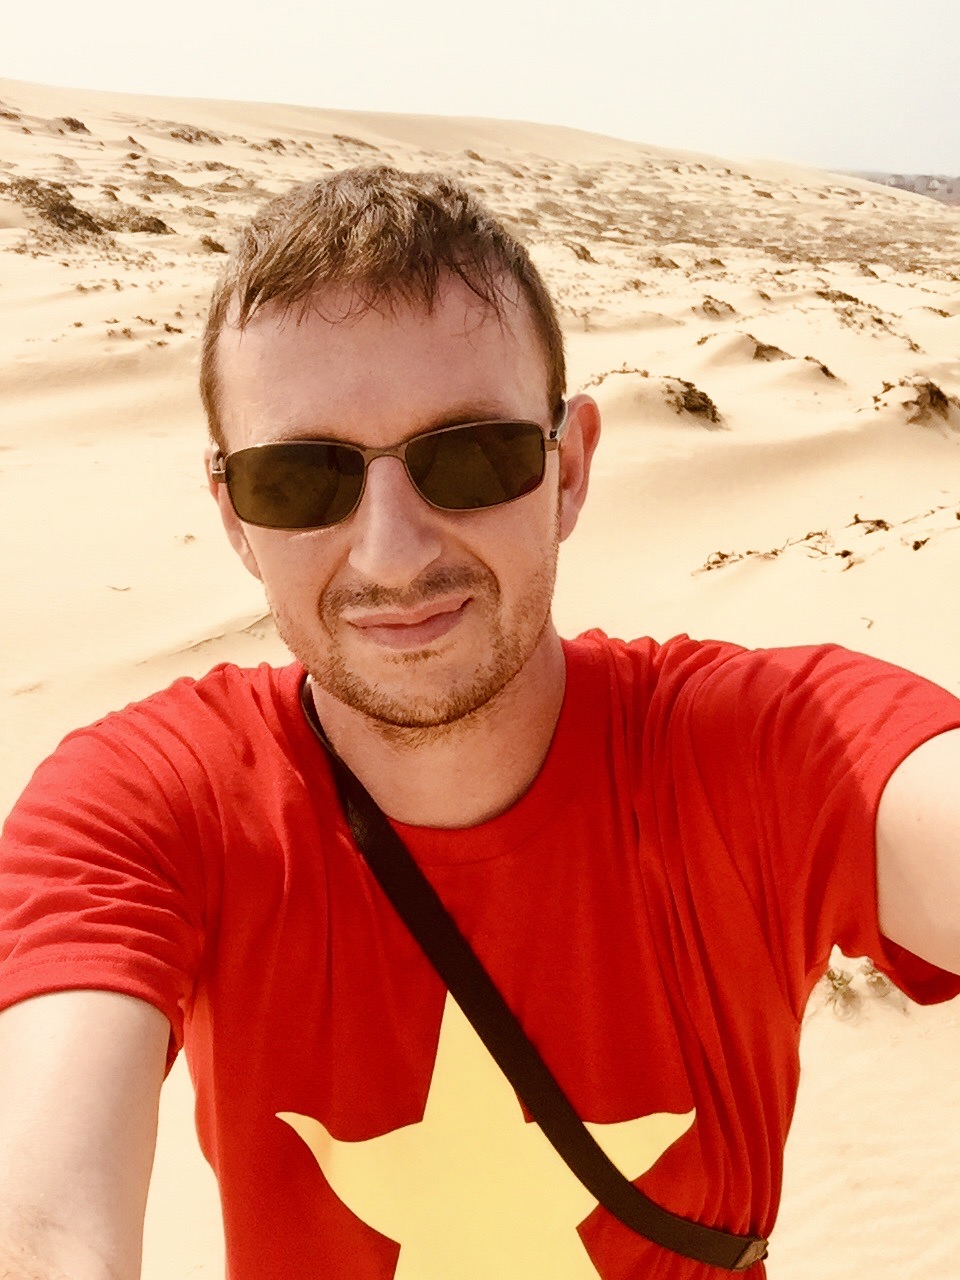 Exploring the Quang Phu Sand Dunes in Vietnam